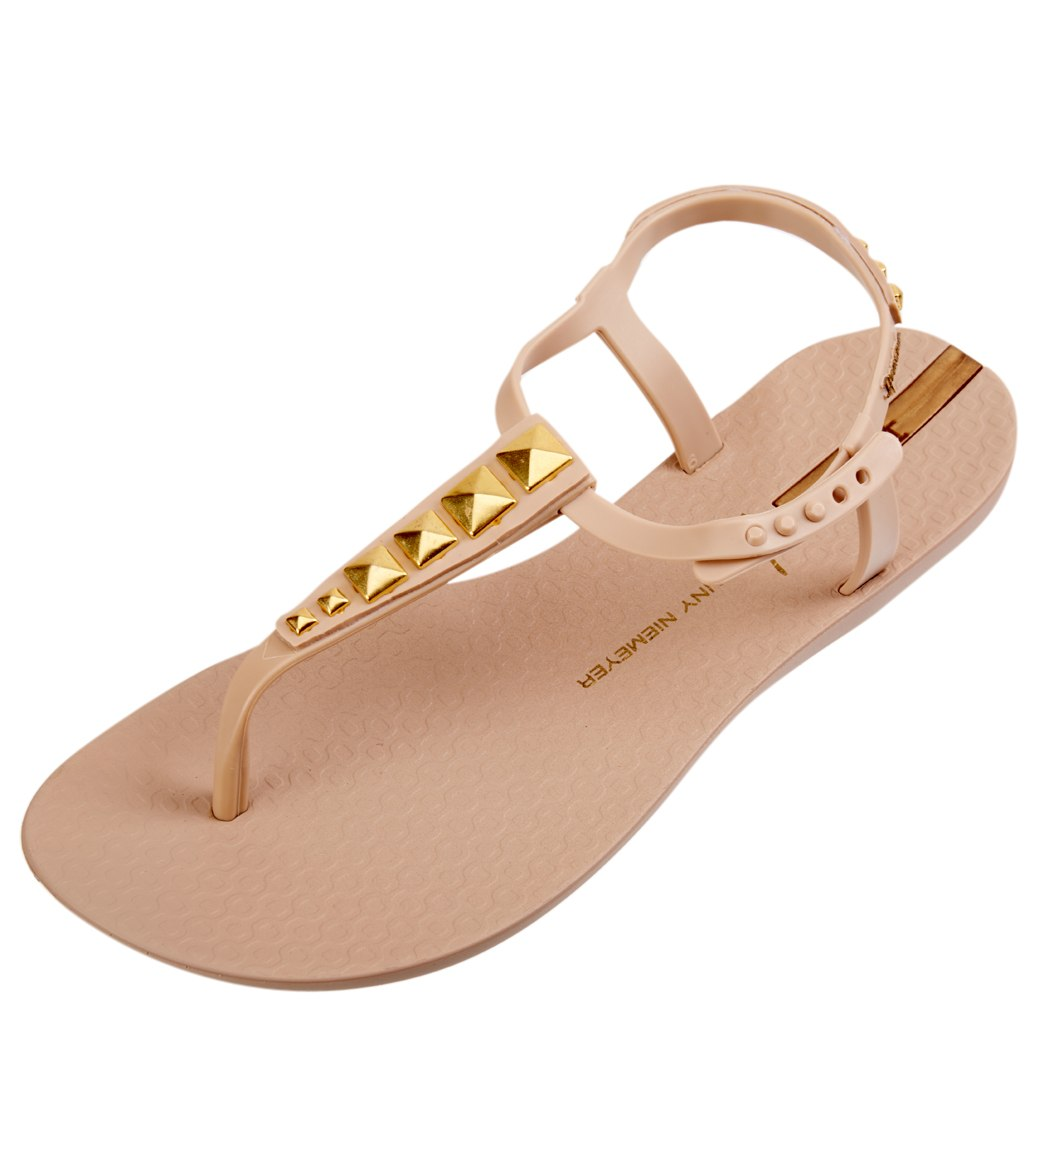 f1cd6b1d7cac Ipanema Women s Premium Lenny Rocker Sandal at SwimOutlet.com - Free  Shipping